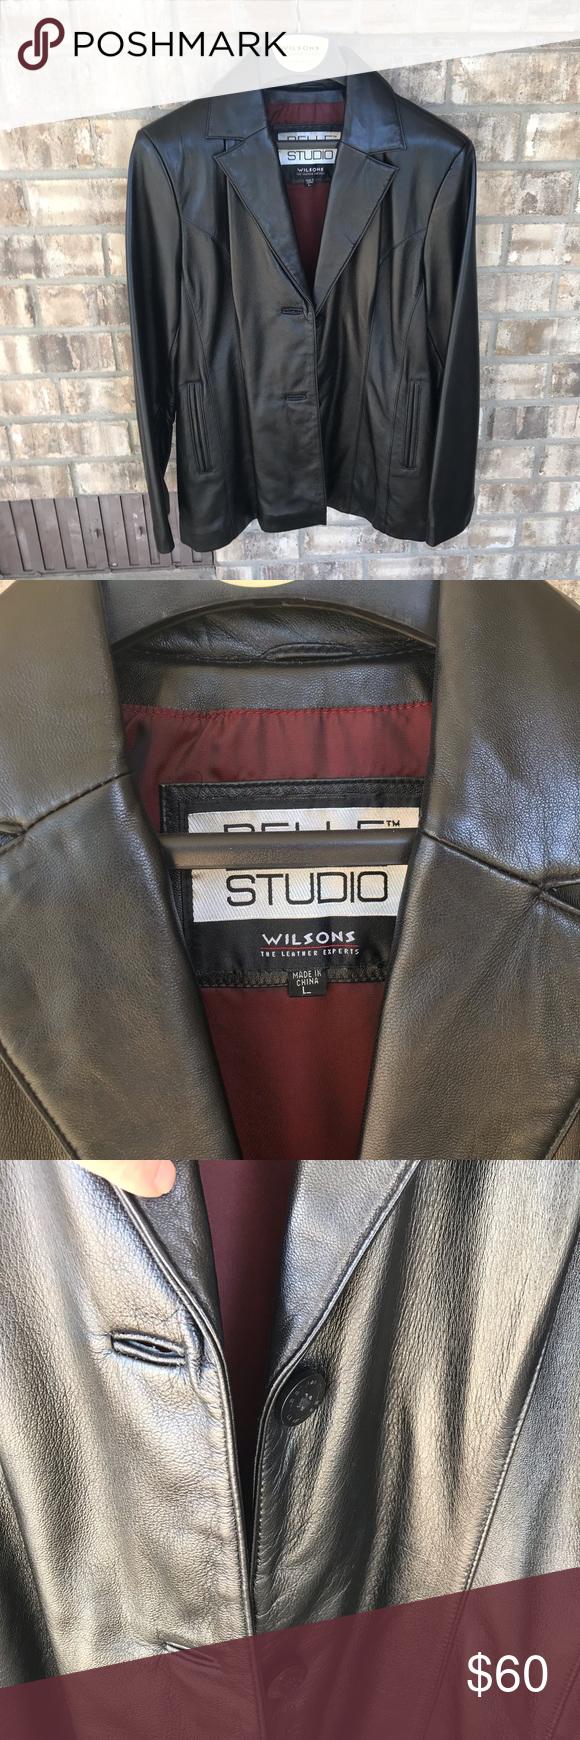 Wilson's leather black jacket Wilson's leather women's